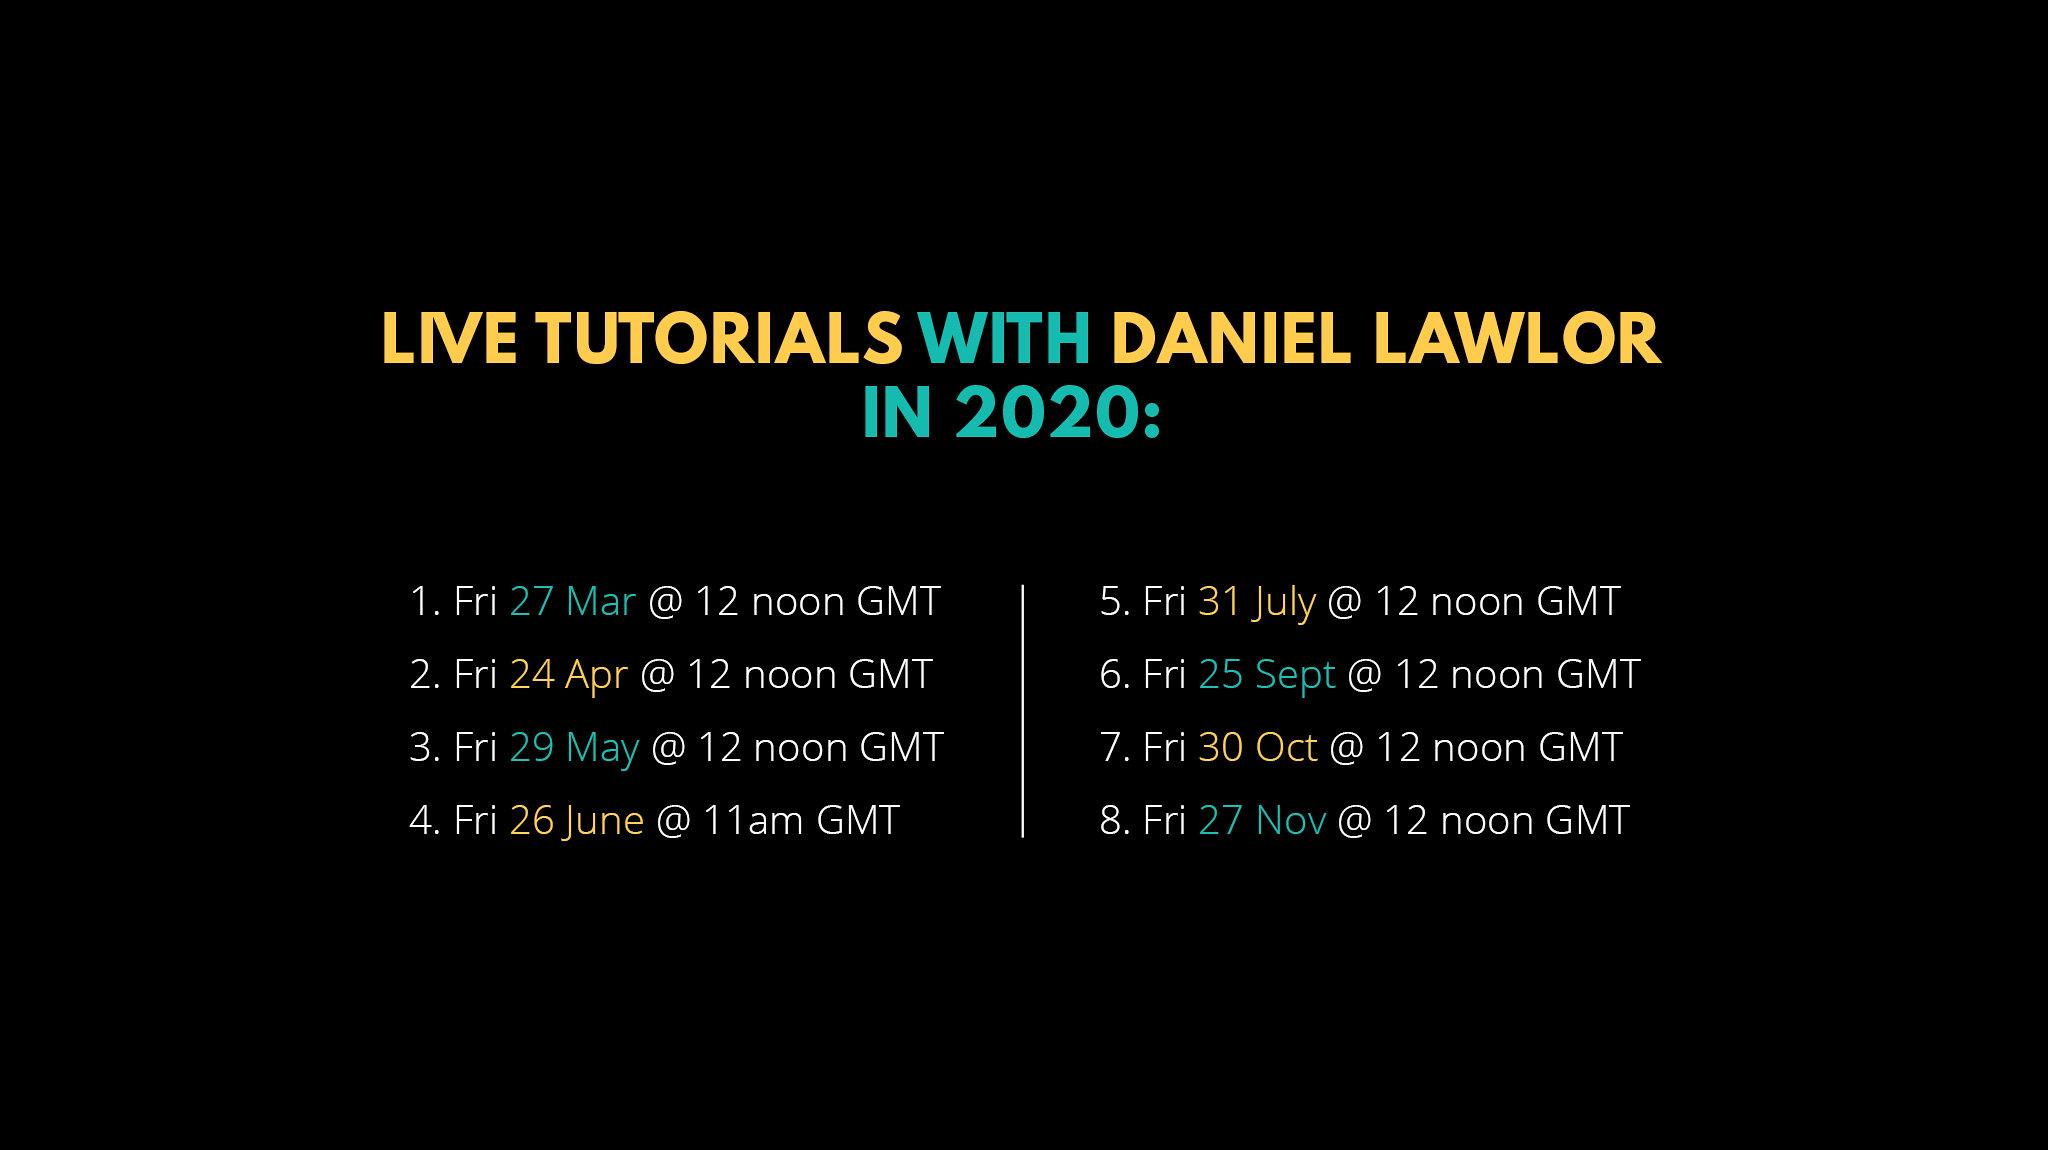 Live Tutorials with Daniel lawlor